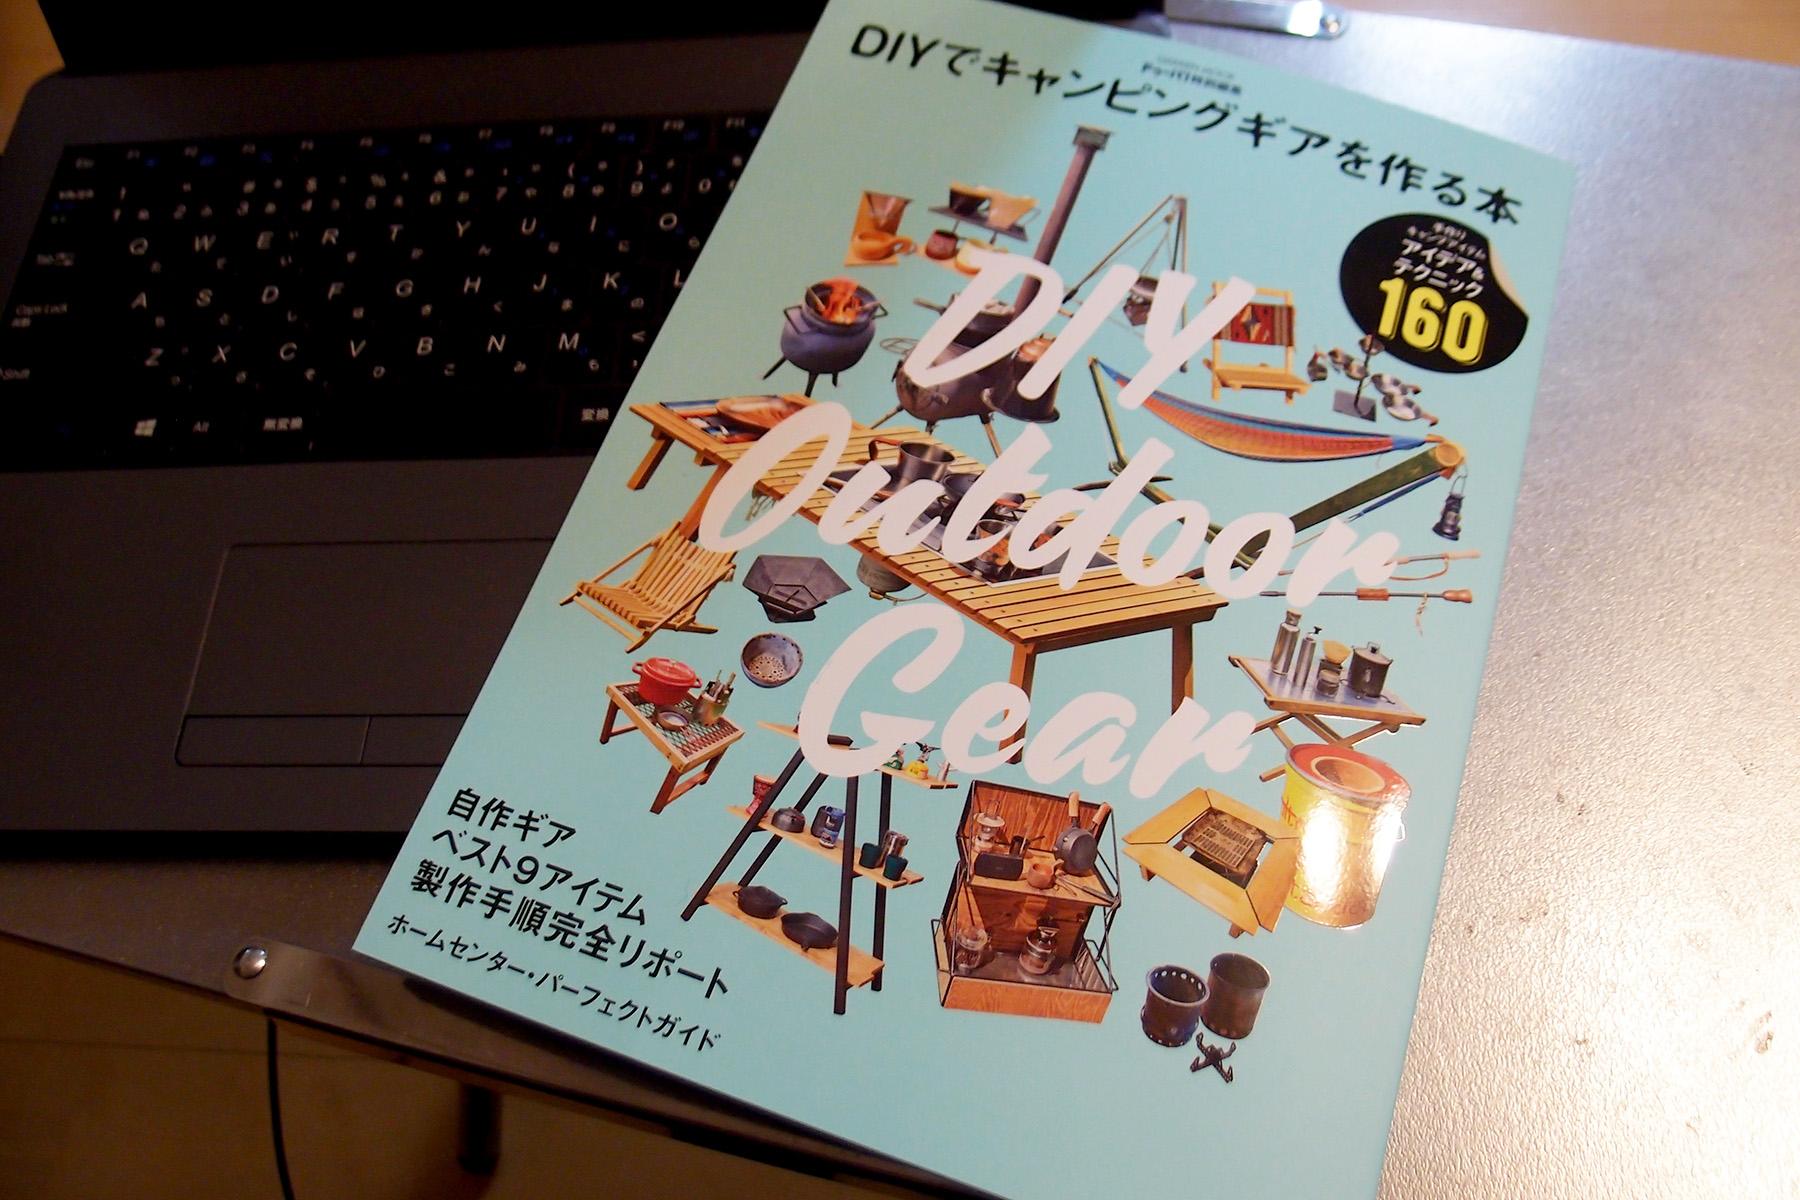 『DIYでキャンピングギアを作る本』